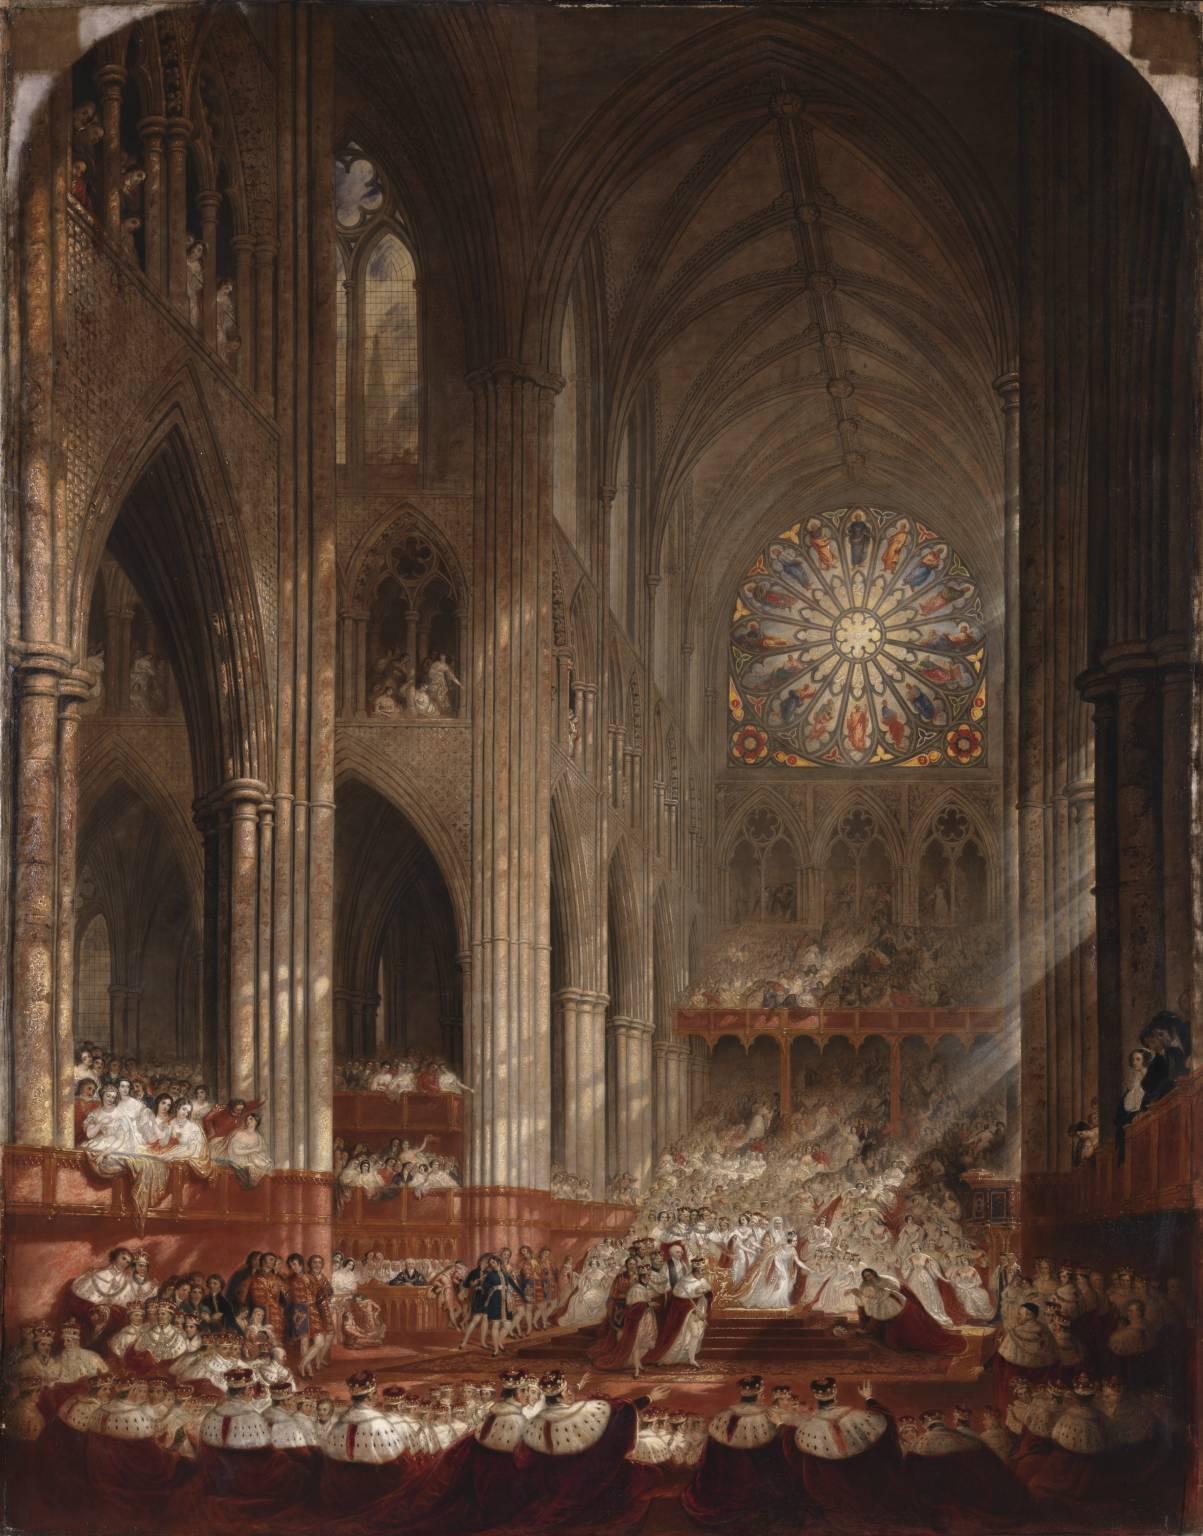 The Coronation of Queen Victoria 1839 by John Martin 1789-1854